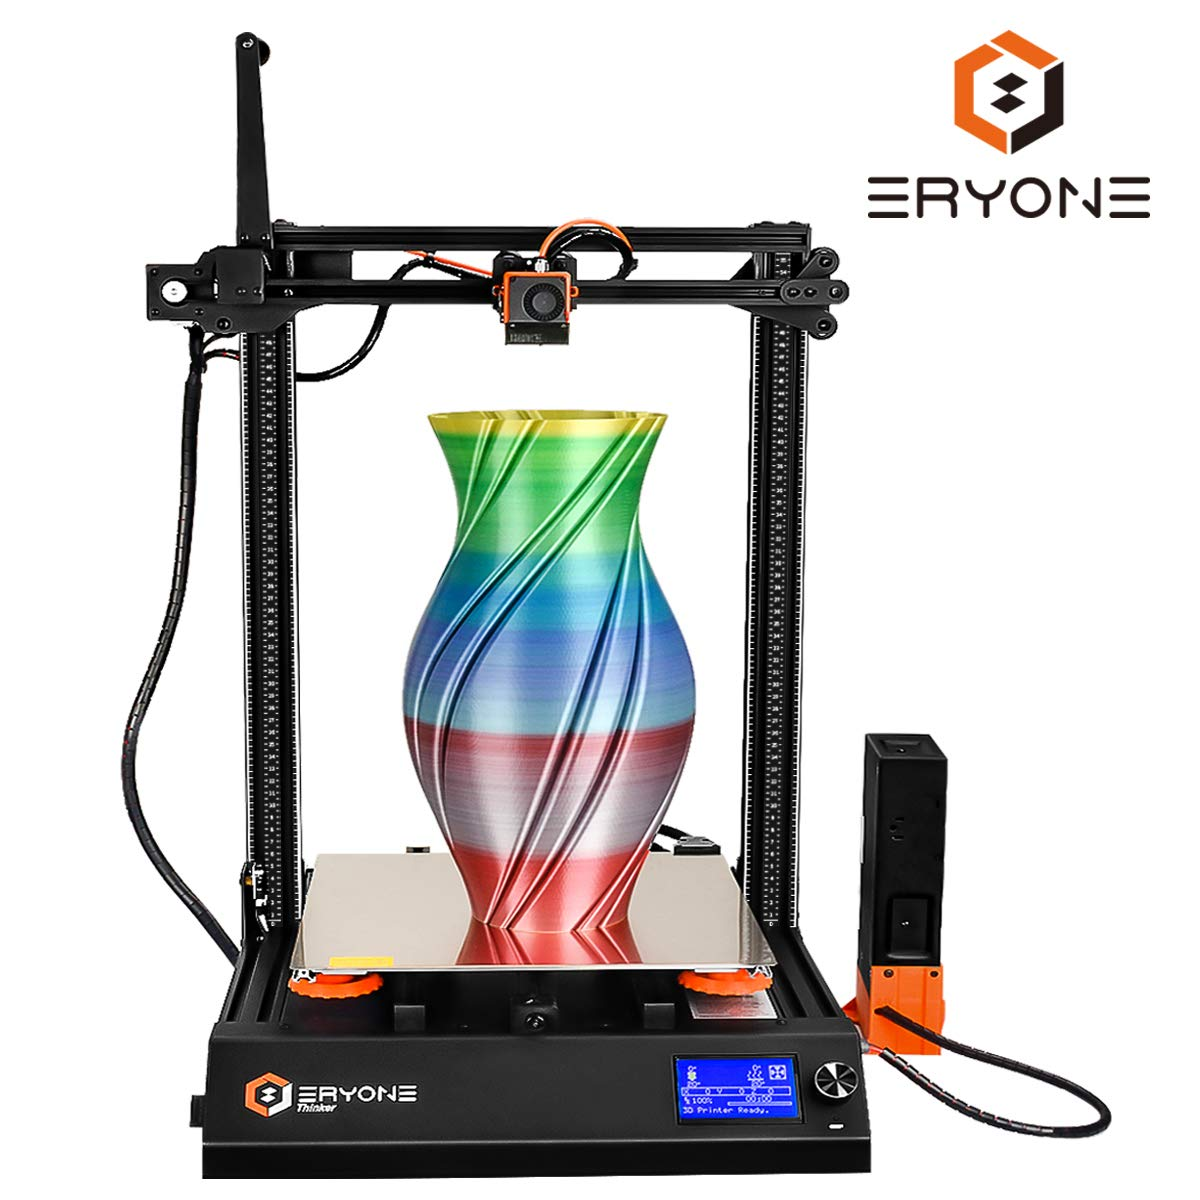 Impresora 3D Eryone Thinker S, Superficie de Impresión PEI ...